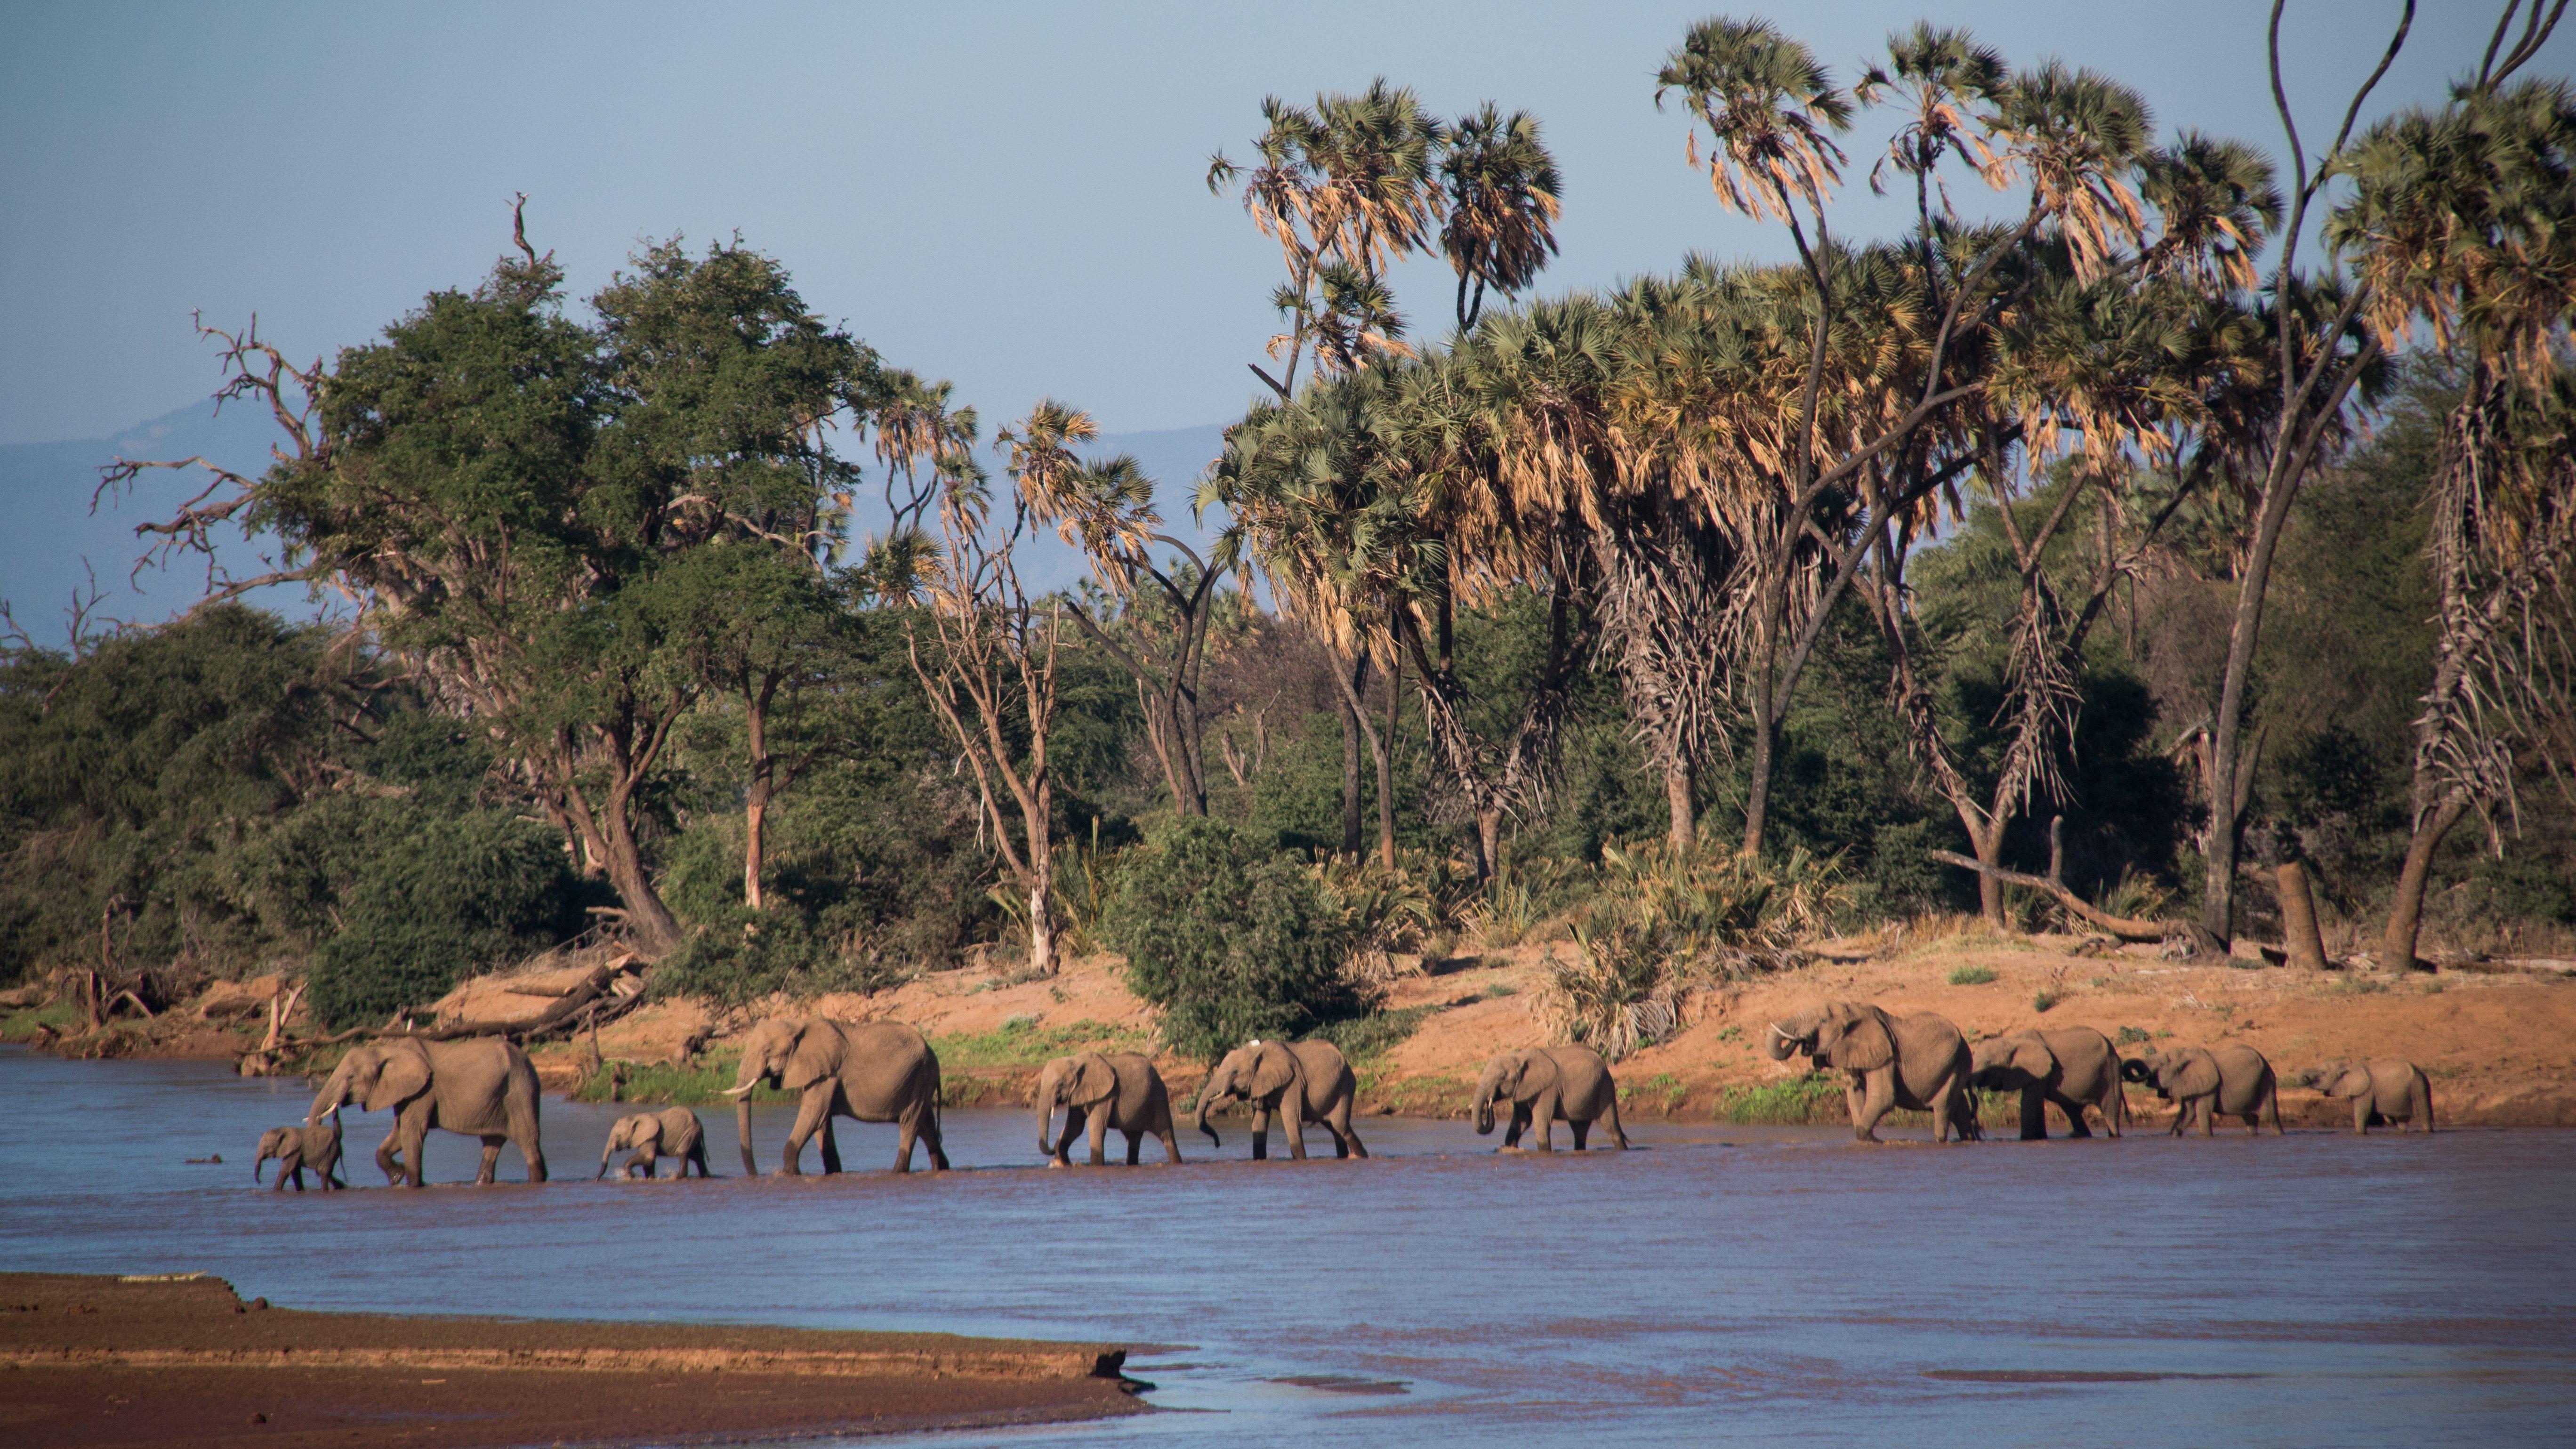 Herd of elephant walking along the river - Samburu Kenya